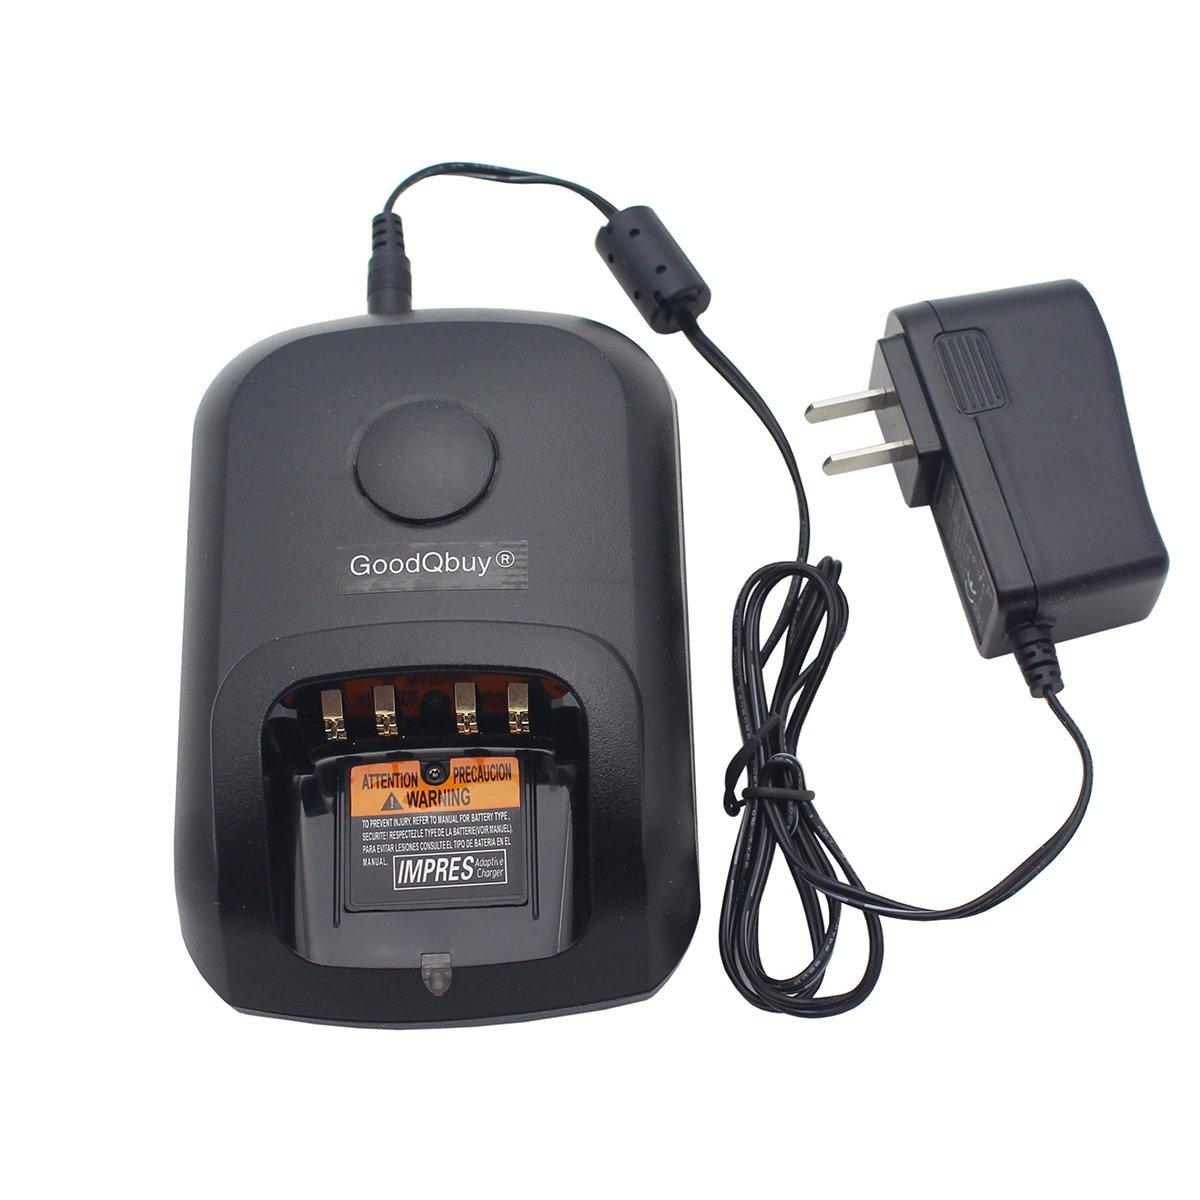 GoodQbuy Battery Charging Dock Desktop Charger For Motorola Radios XPR-6300 XPR-6550 XiR P-8200 DP-3600 XPR6580 XPR6380 XPR6500